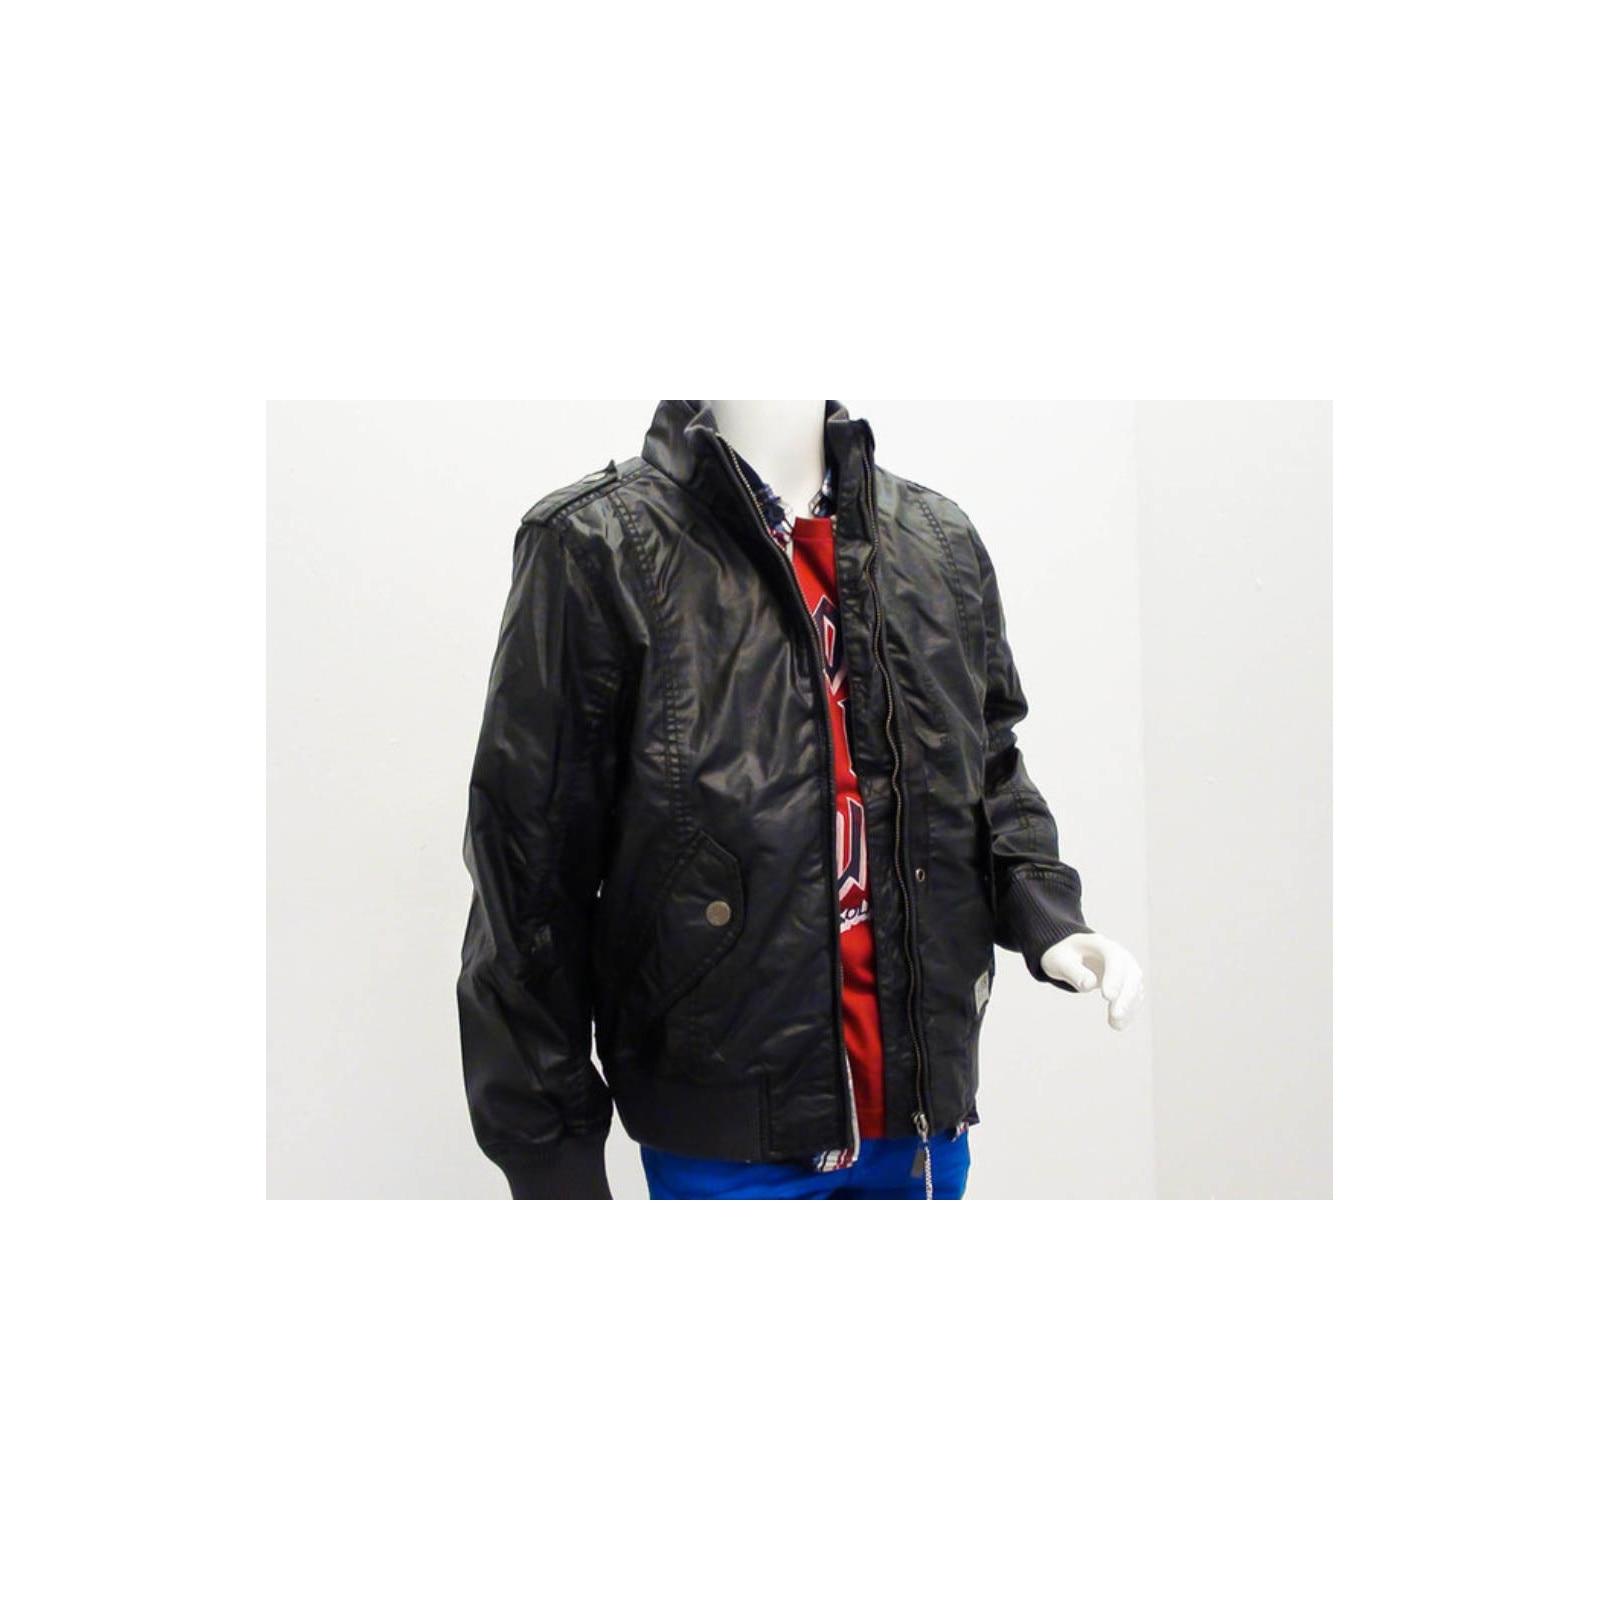 Fekete dzseki (152) Ruhafalva